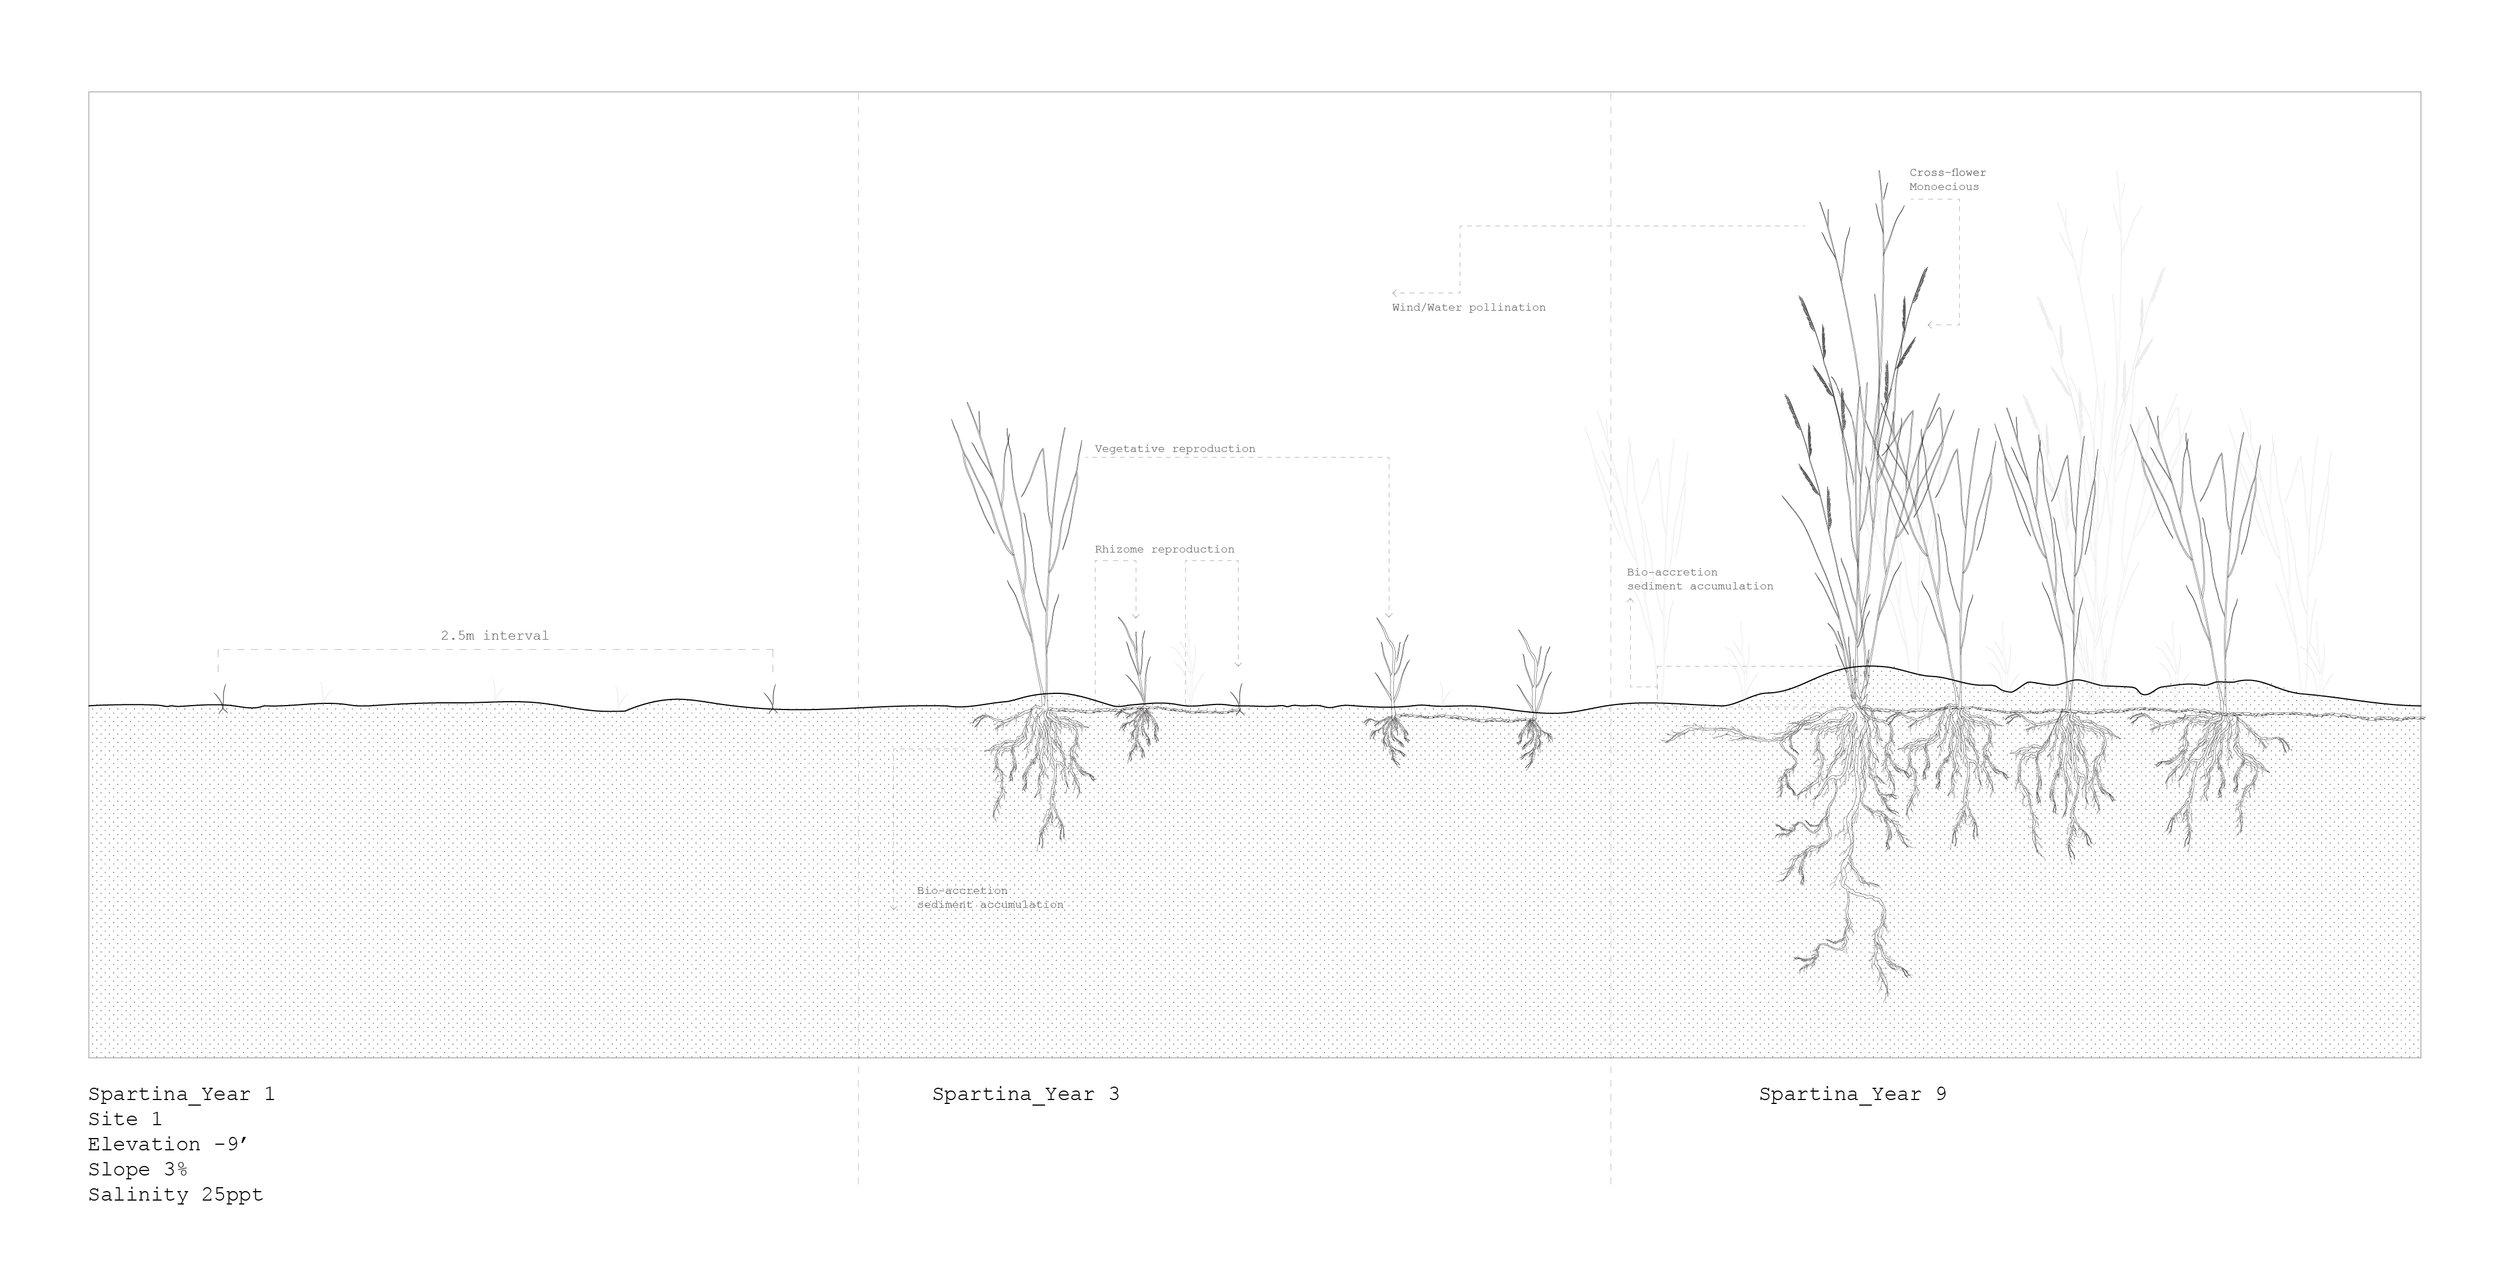 Spartina Alterniflora, Growth Analysis